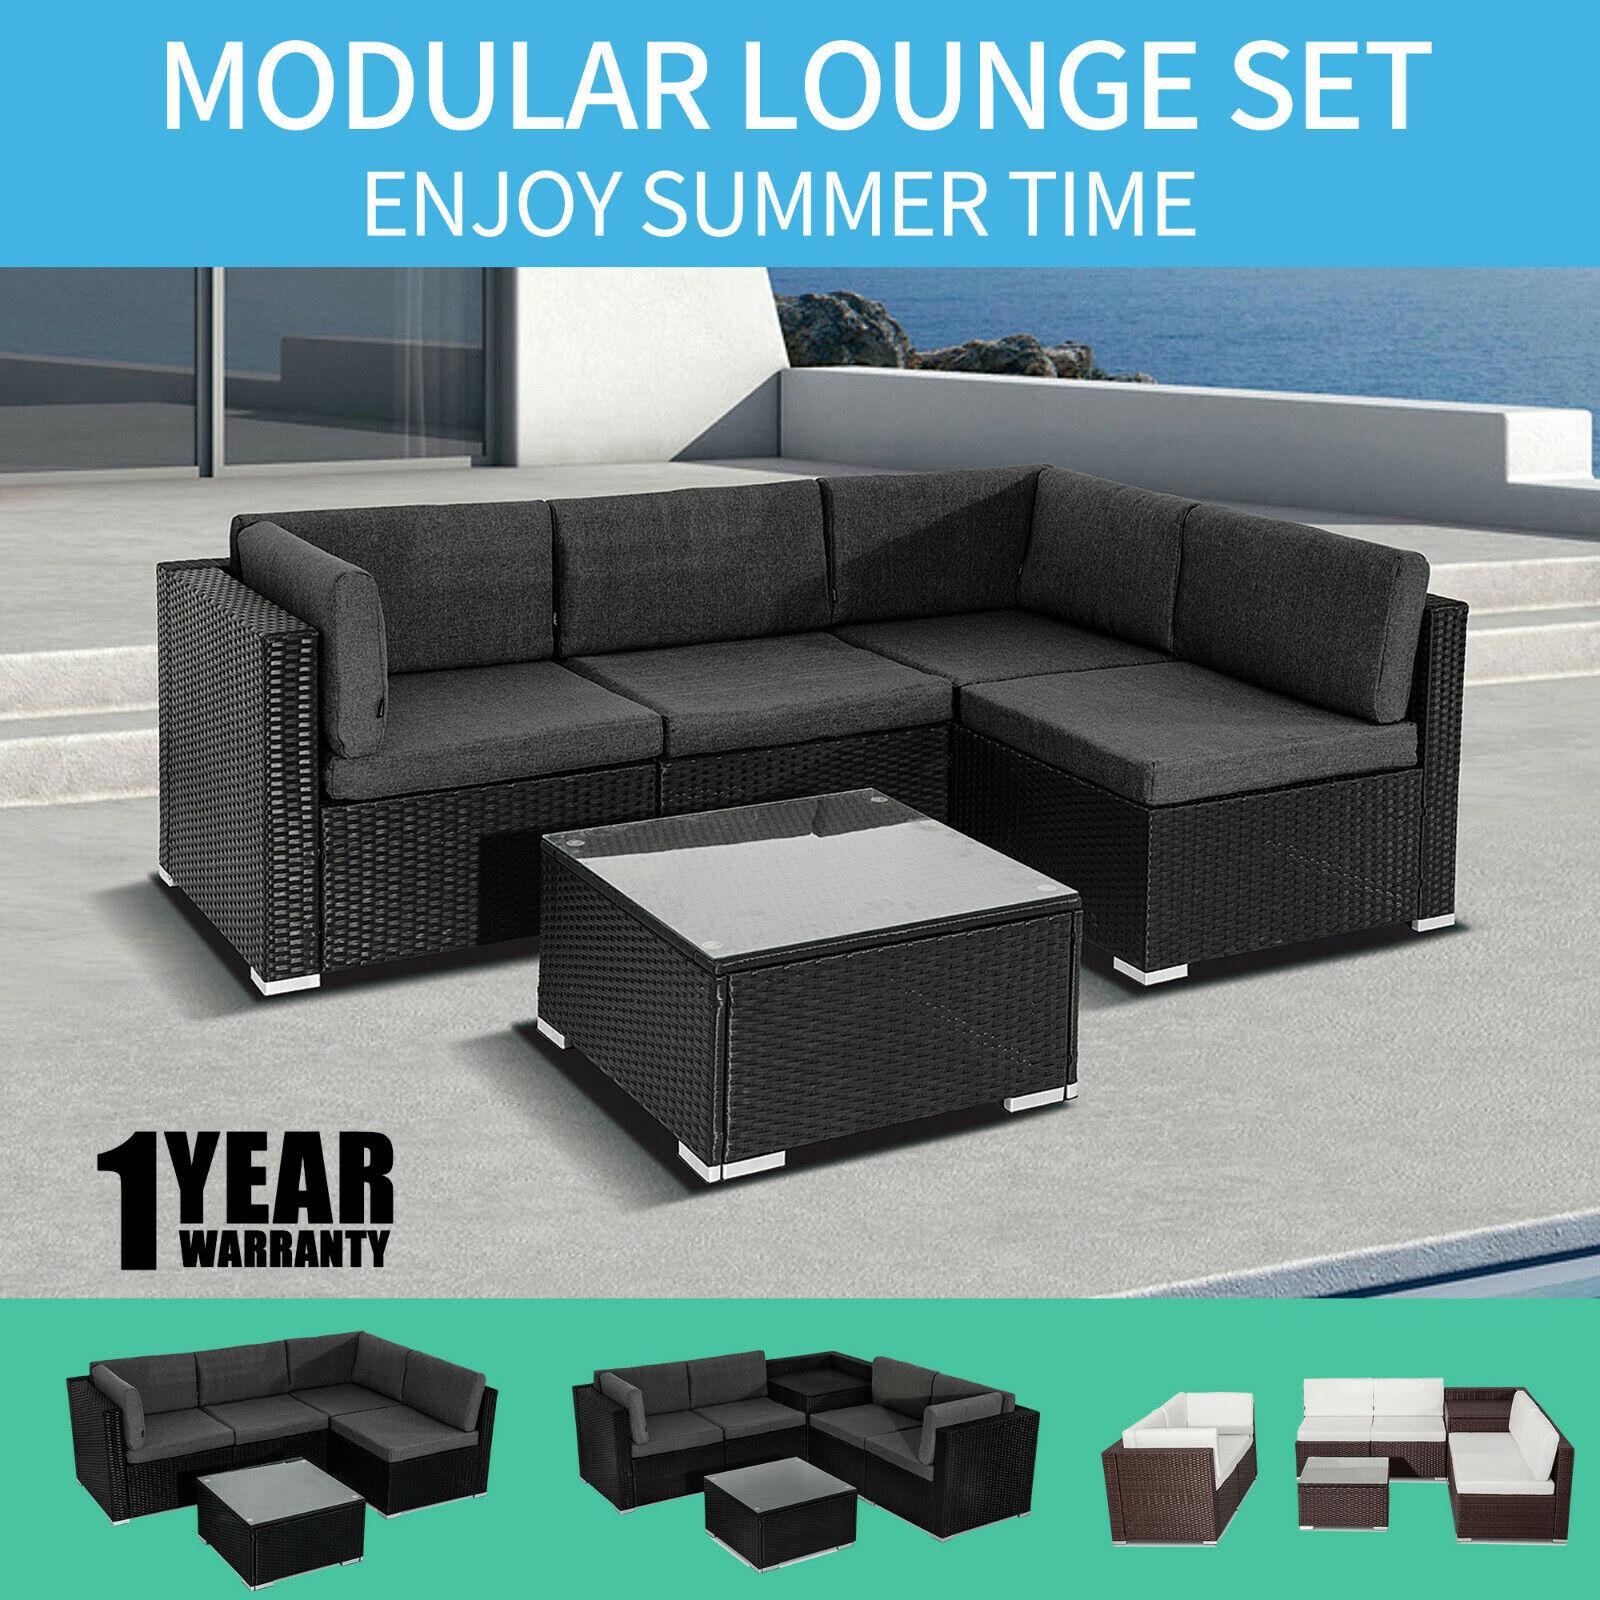 Garden Furniture - Outdoor Furniture Set PE Wicker Garden Modular Lounge Sofa Set